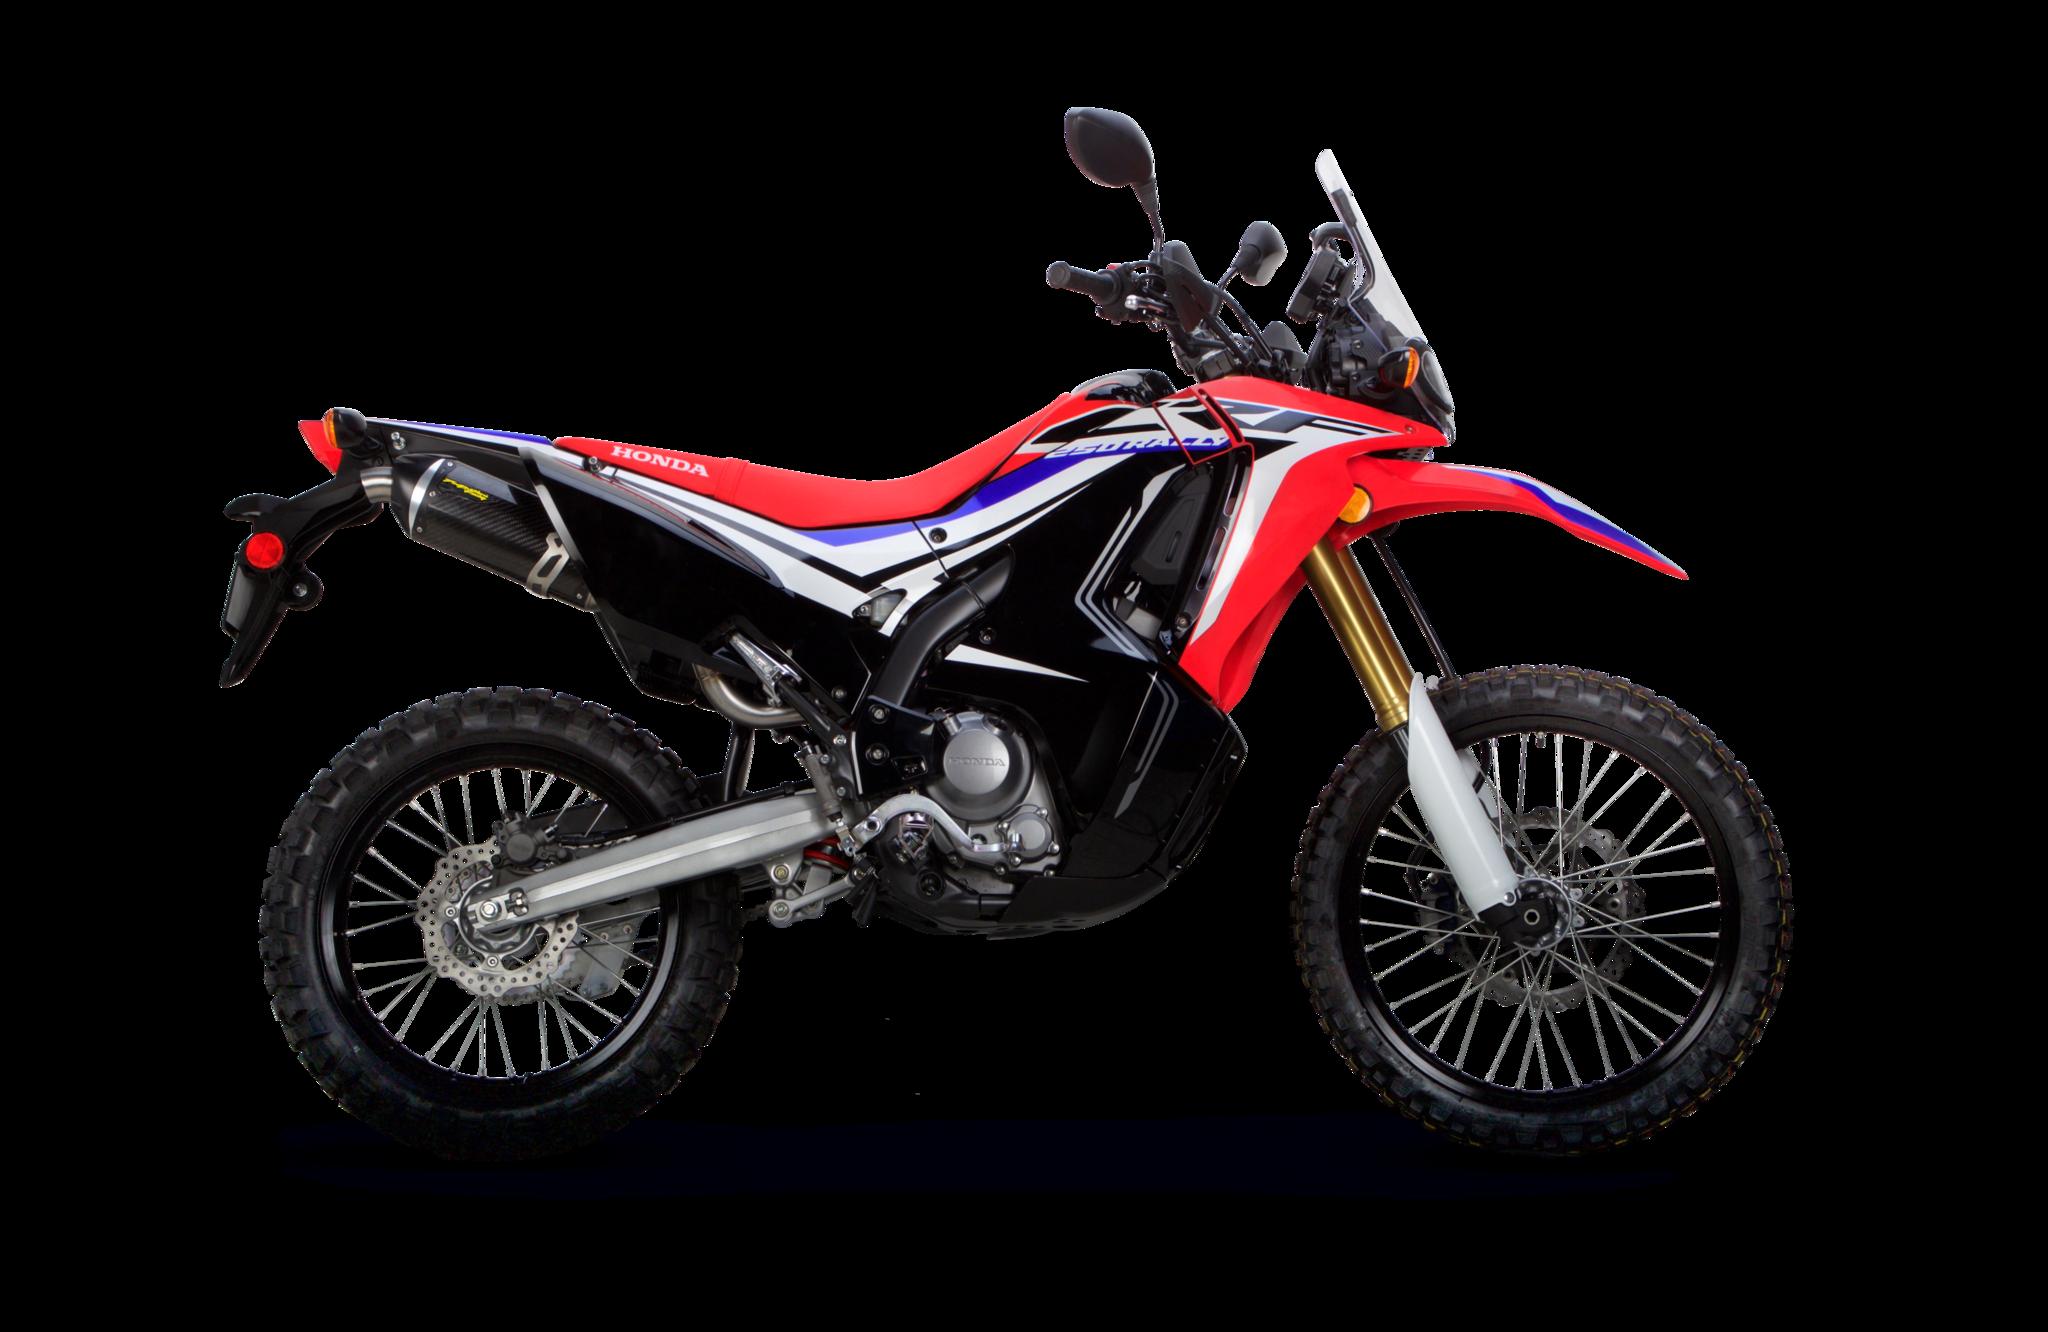 Honda Crf250l Rally S1r Slip On System 2017 2019 Pit Bike